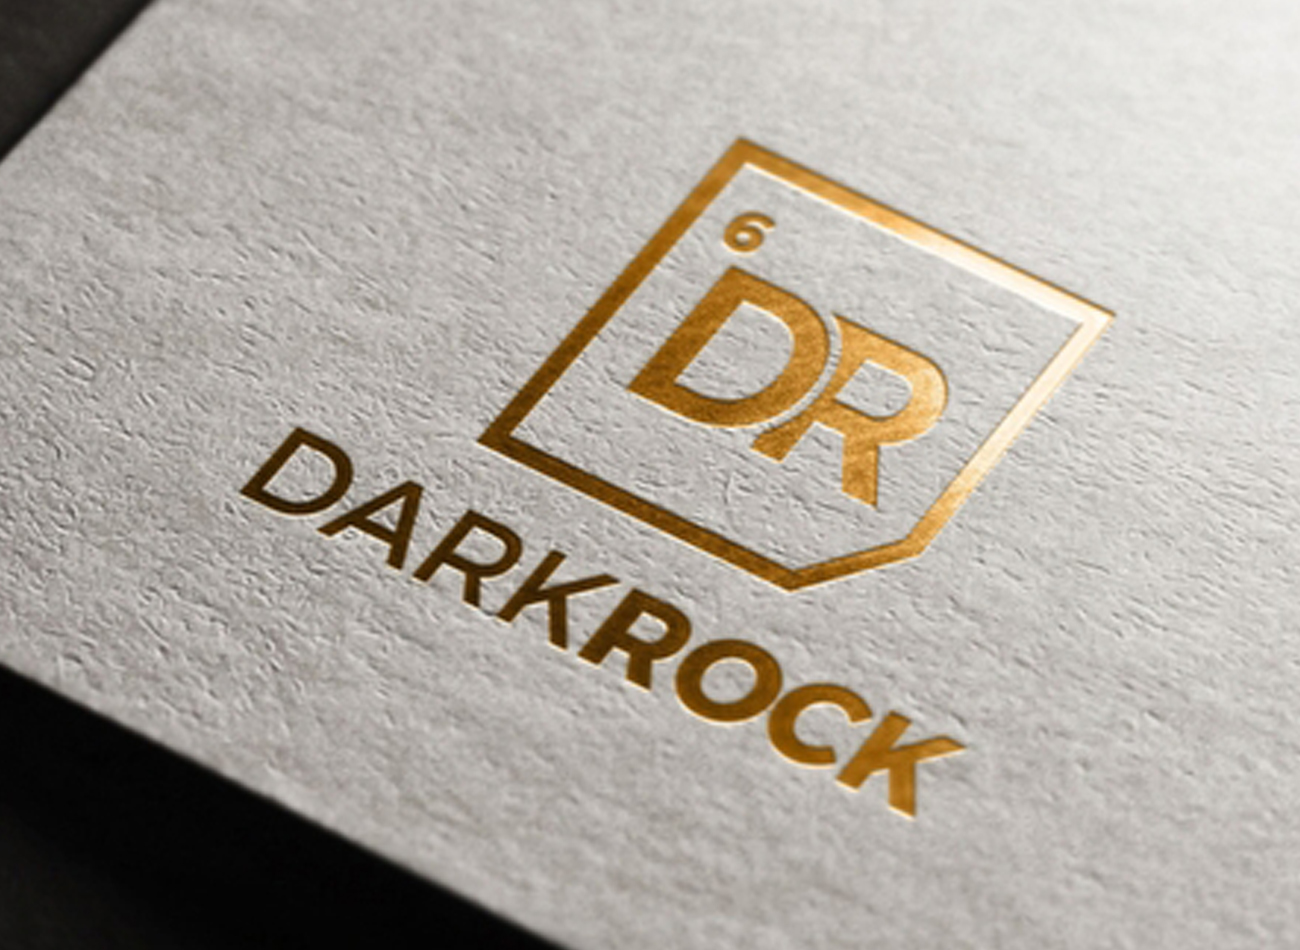 dark-rock-naming-corporate-logo-designers-agent-orange-south-africa-branding-agency.jpg